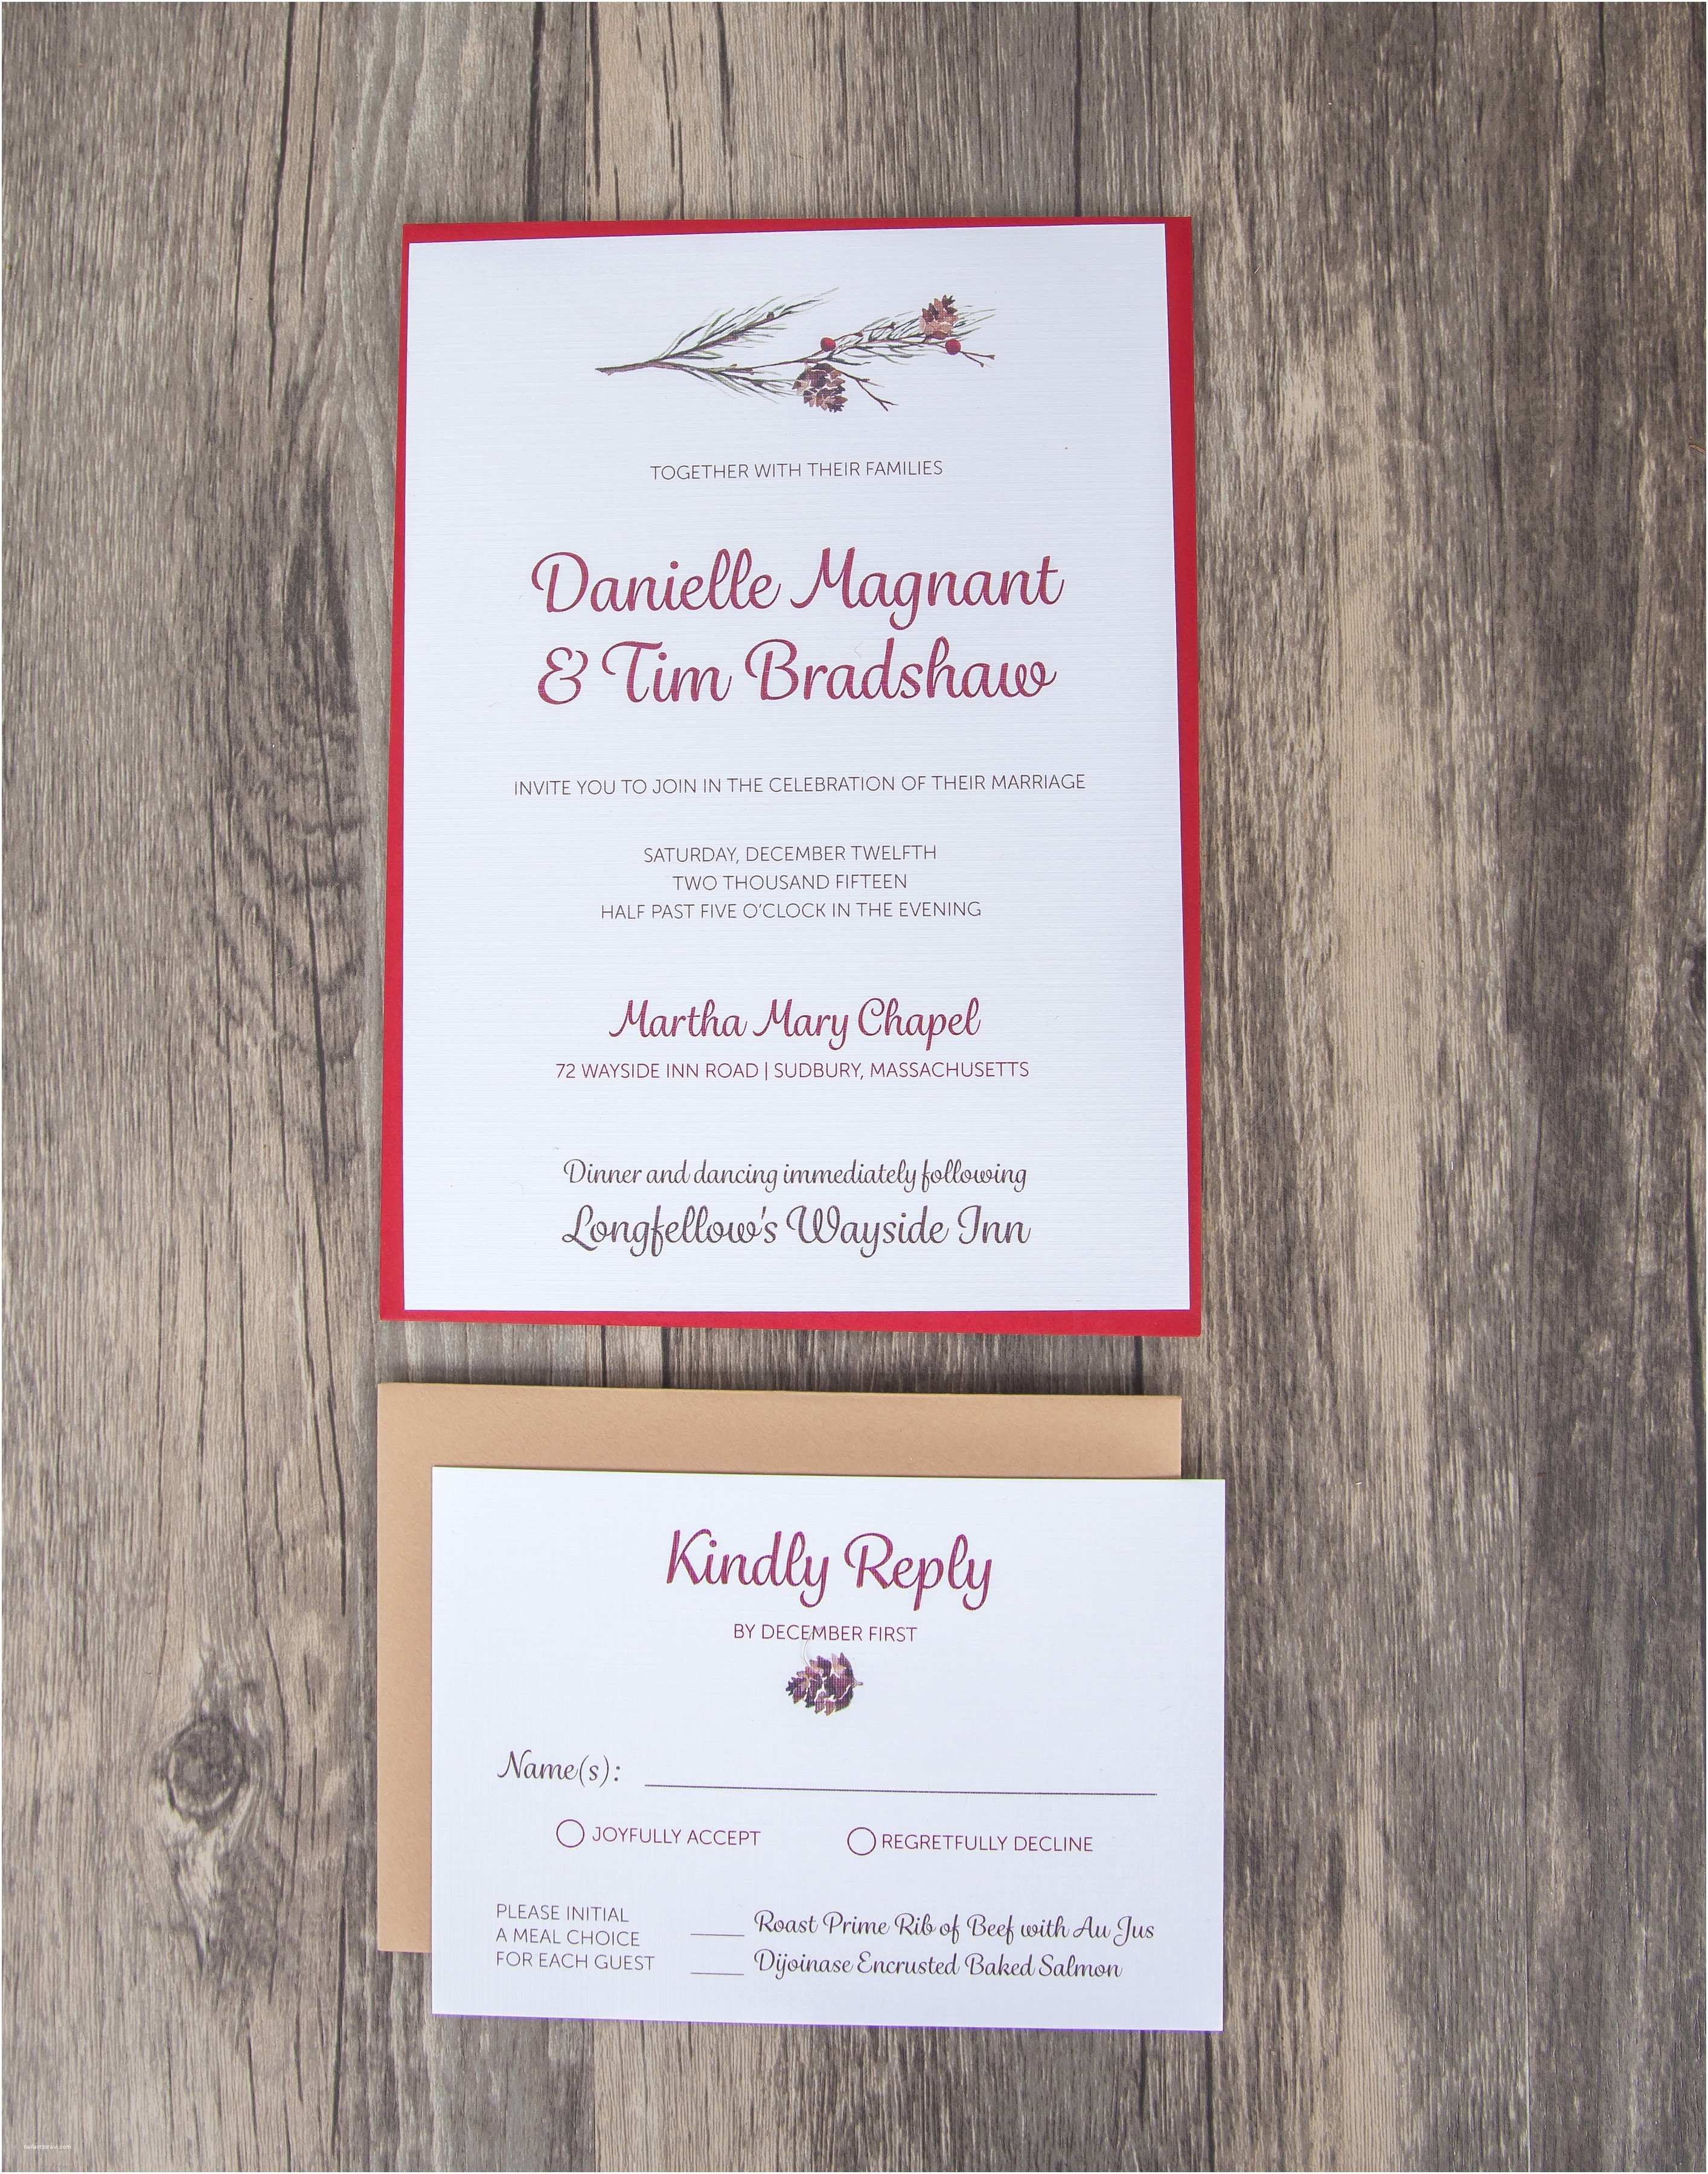 Staples Wedding Invitation Kits Wedding Invitation Kits Staples Canada Yaseen for